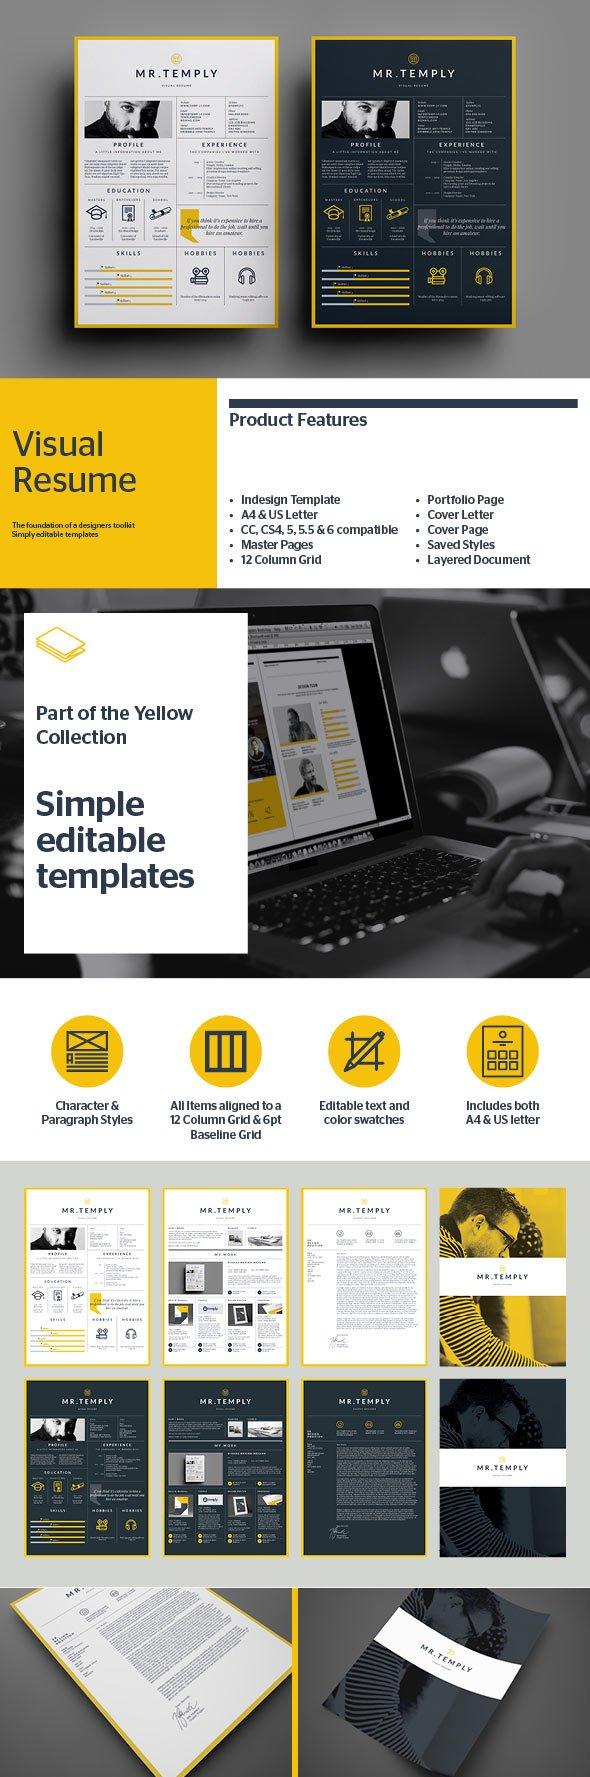 Visual Creative Resume Template